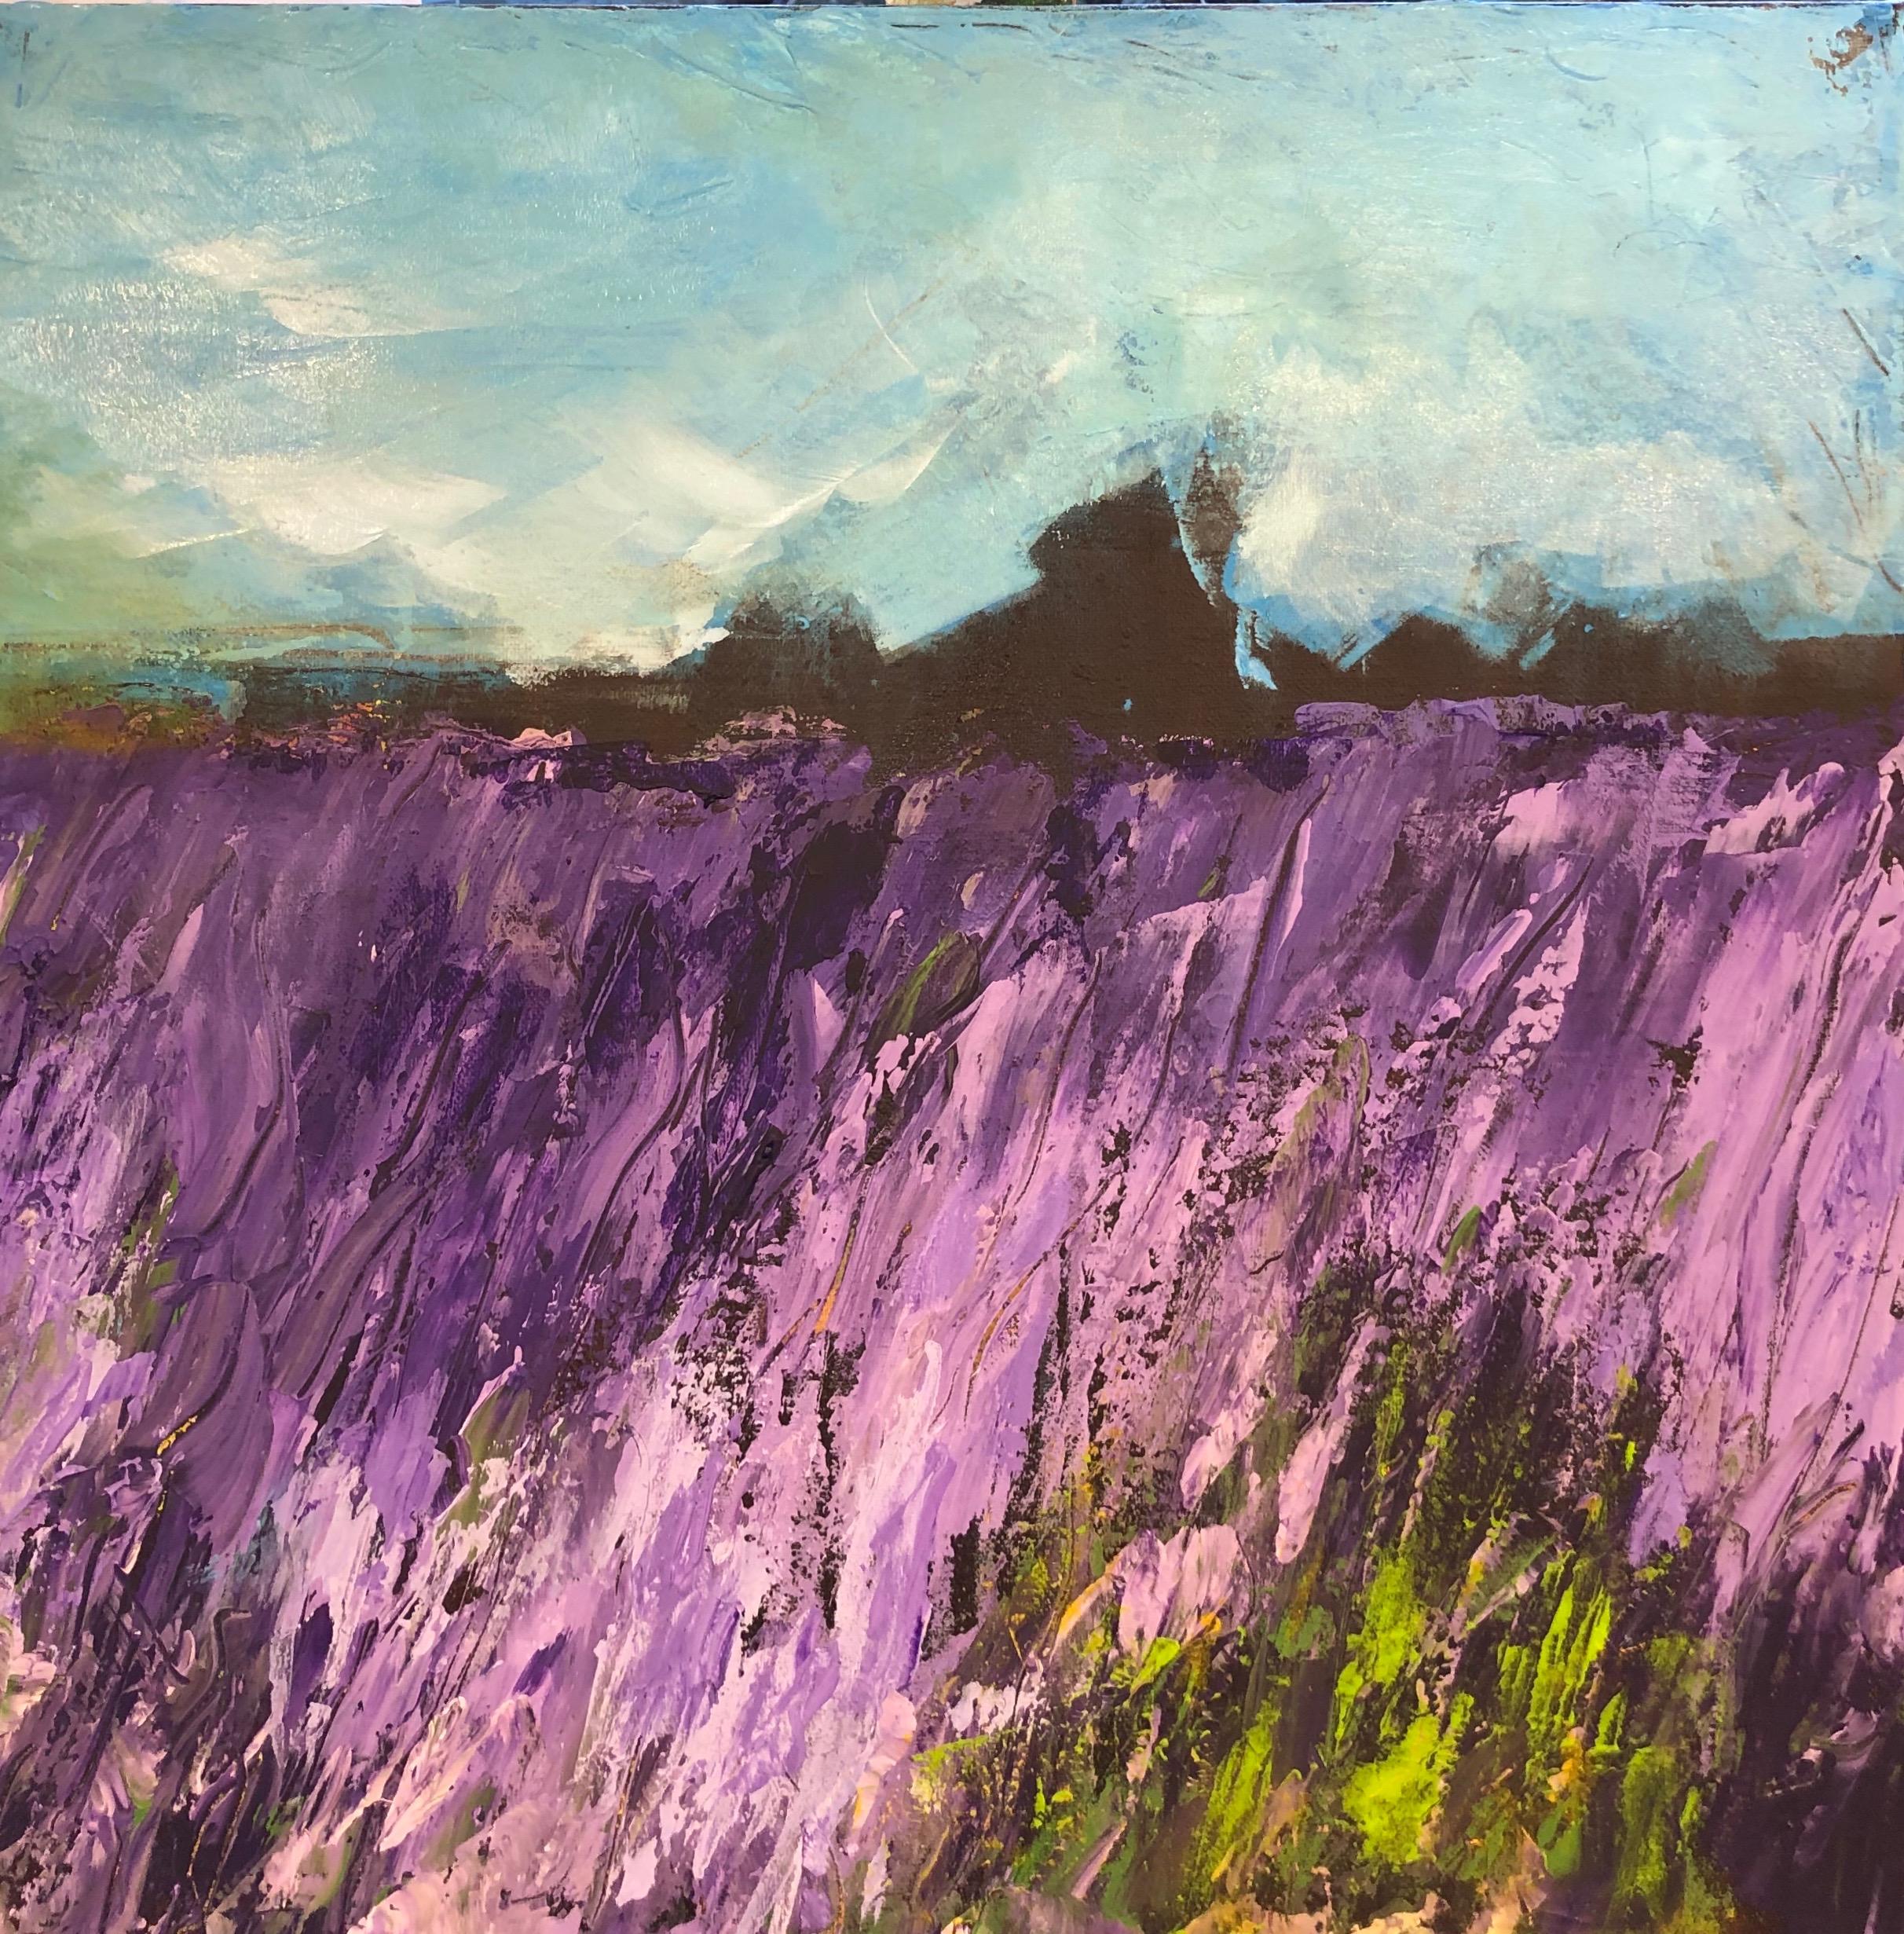 No. 219 - violett